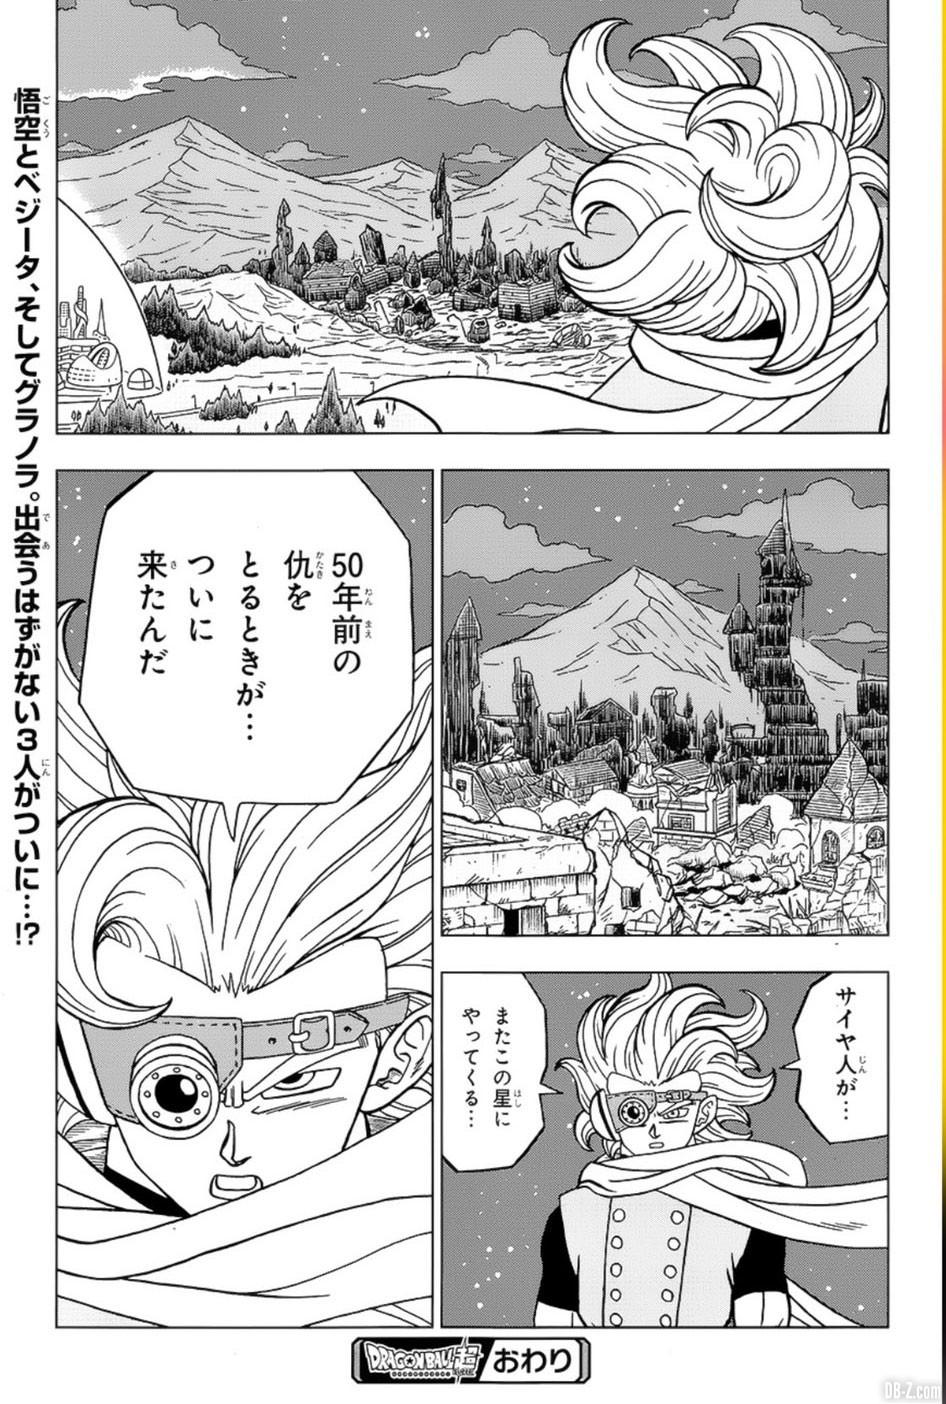 DBS-chap-71-page-0000003